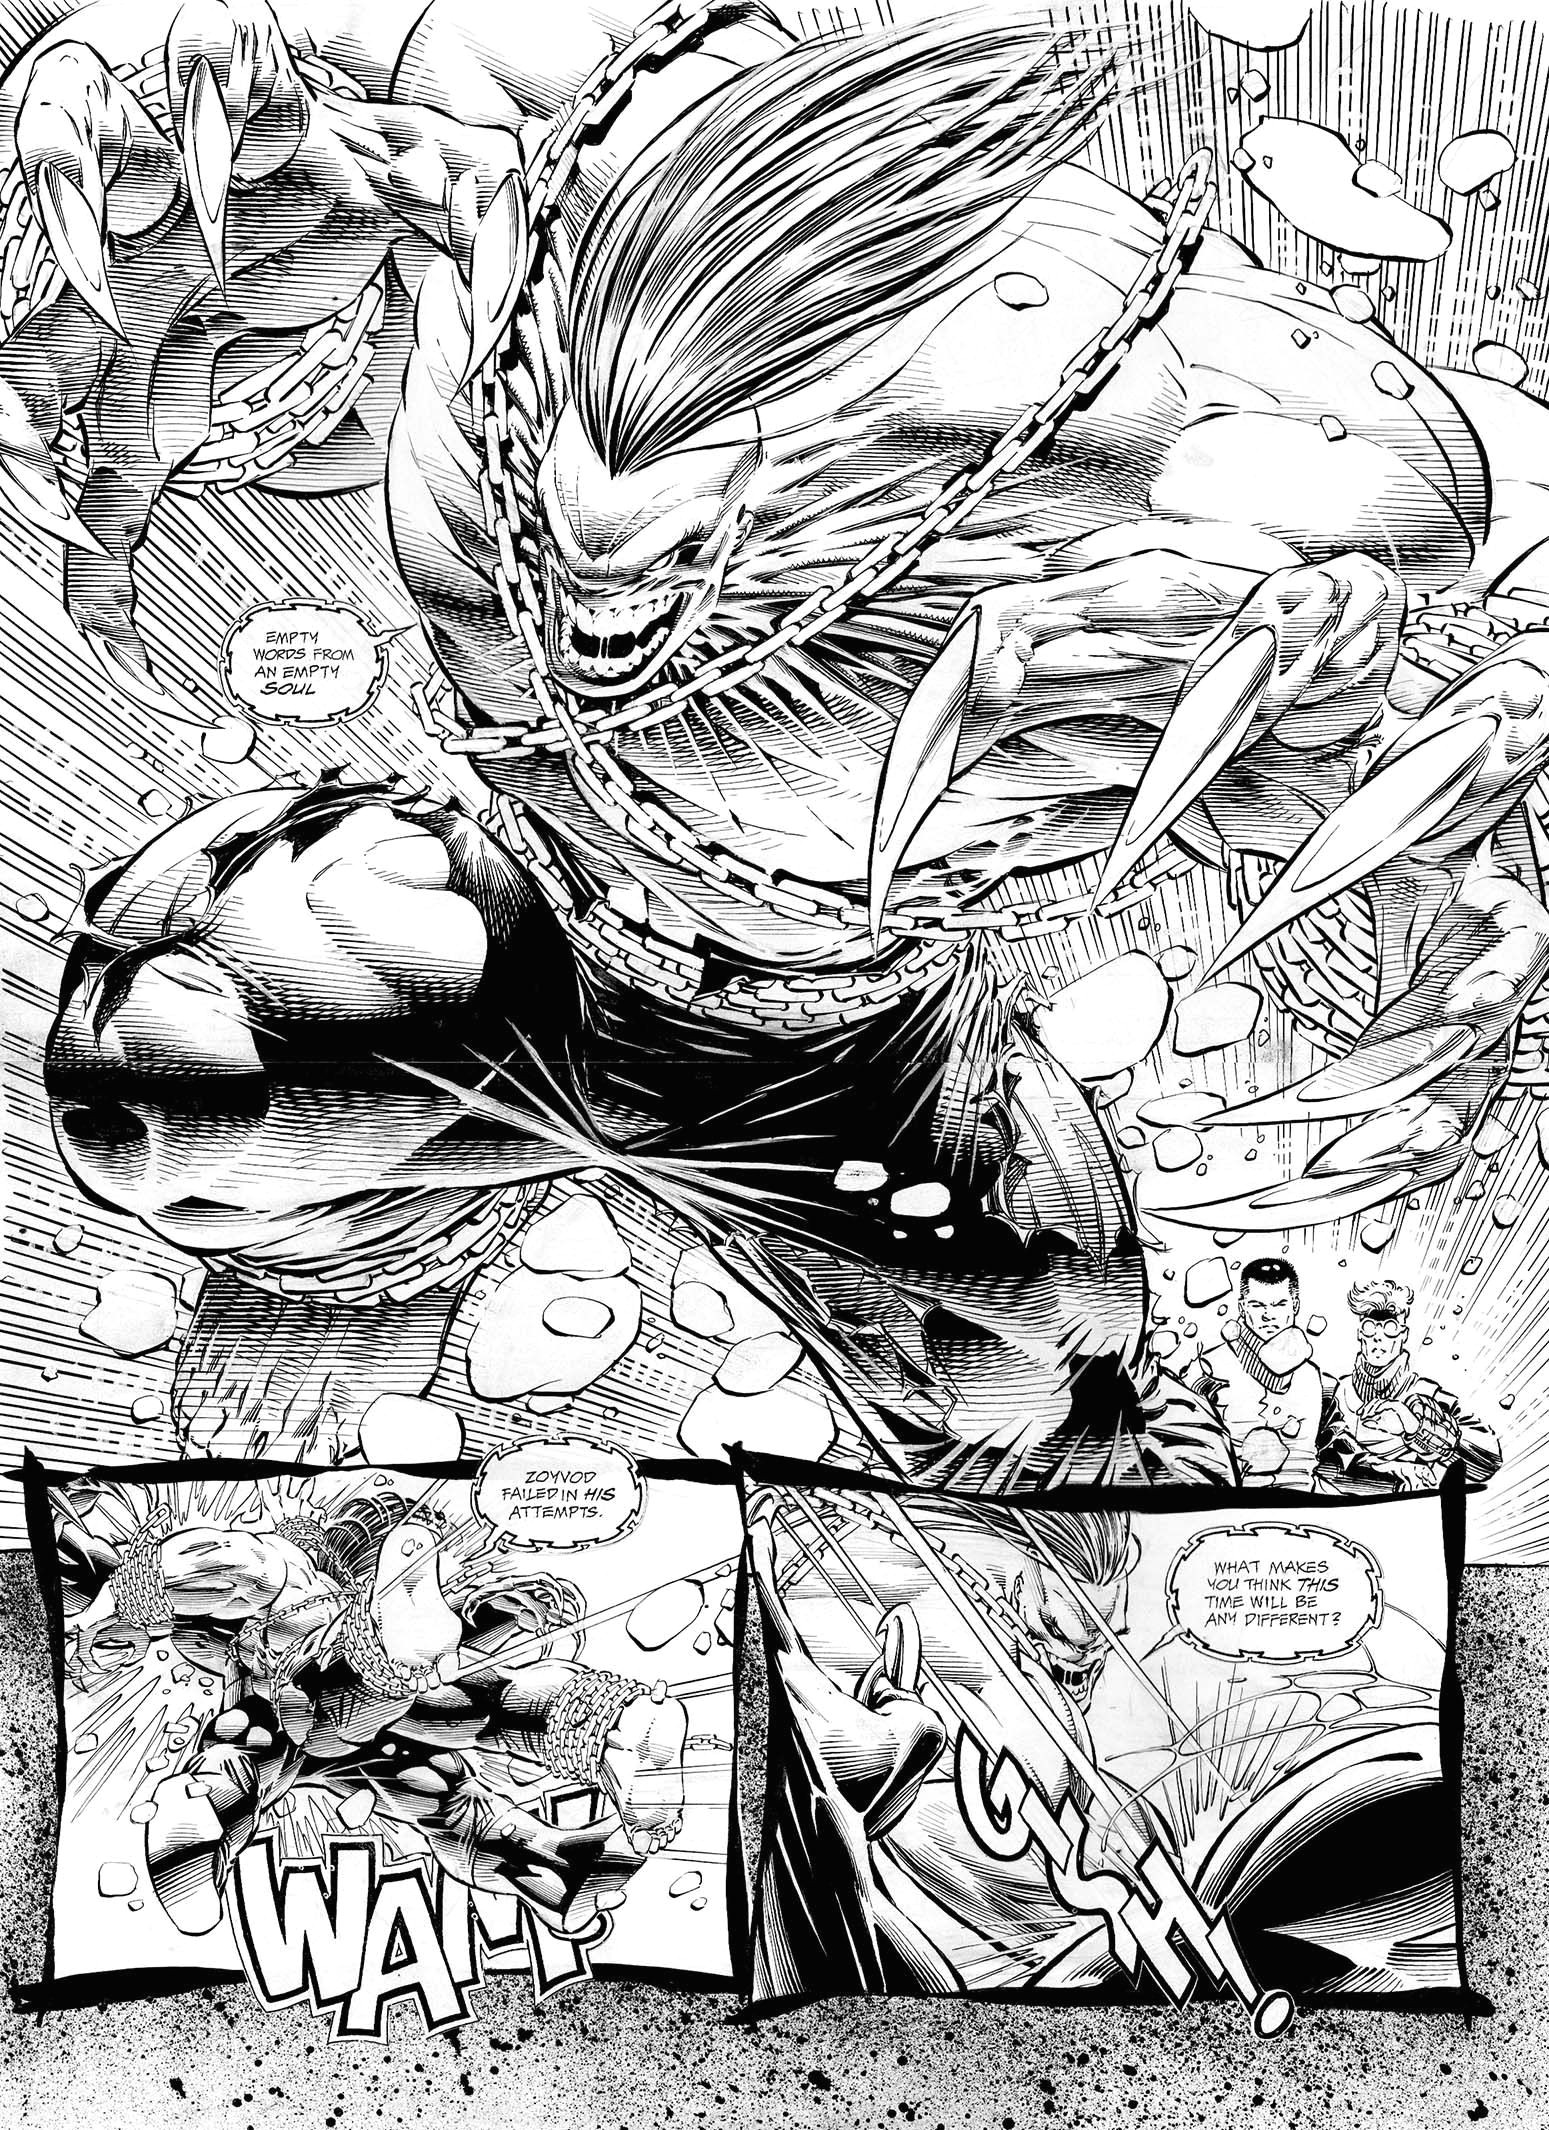 pitt by dale keown comic art comic books art book art ink